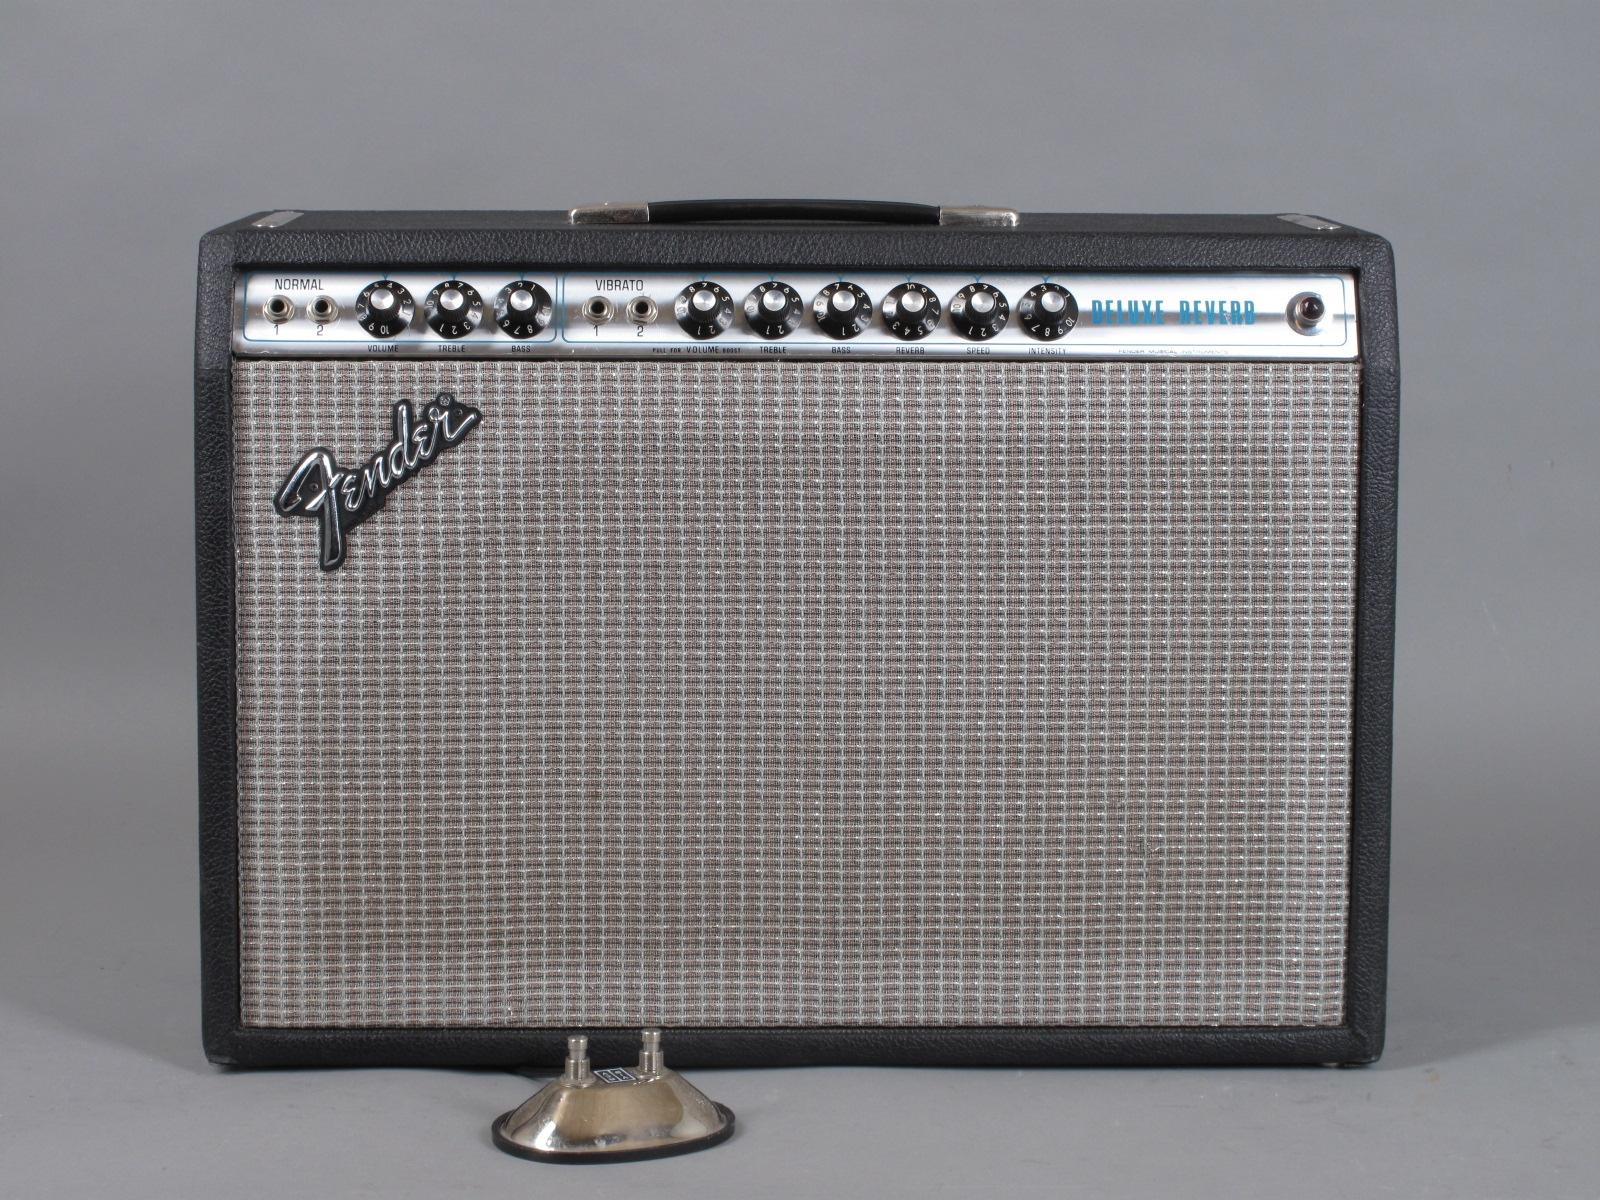 1978 Fender Deluxe Reverb Amp  / Export-version !